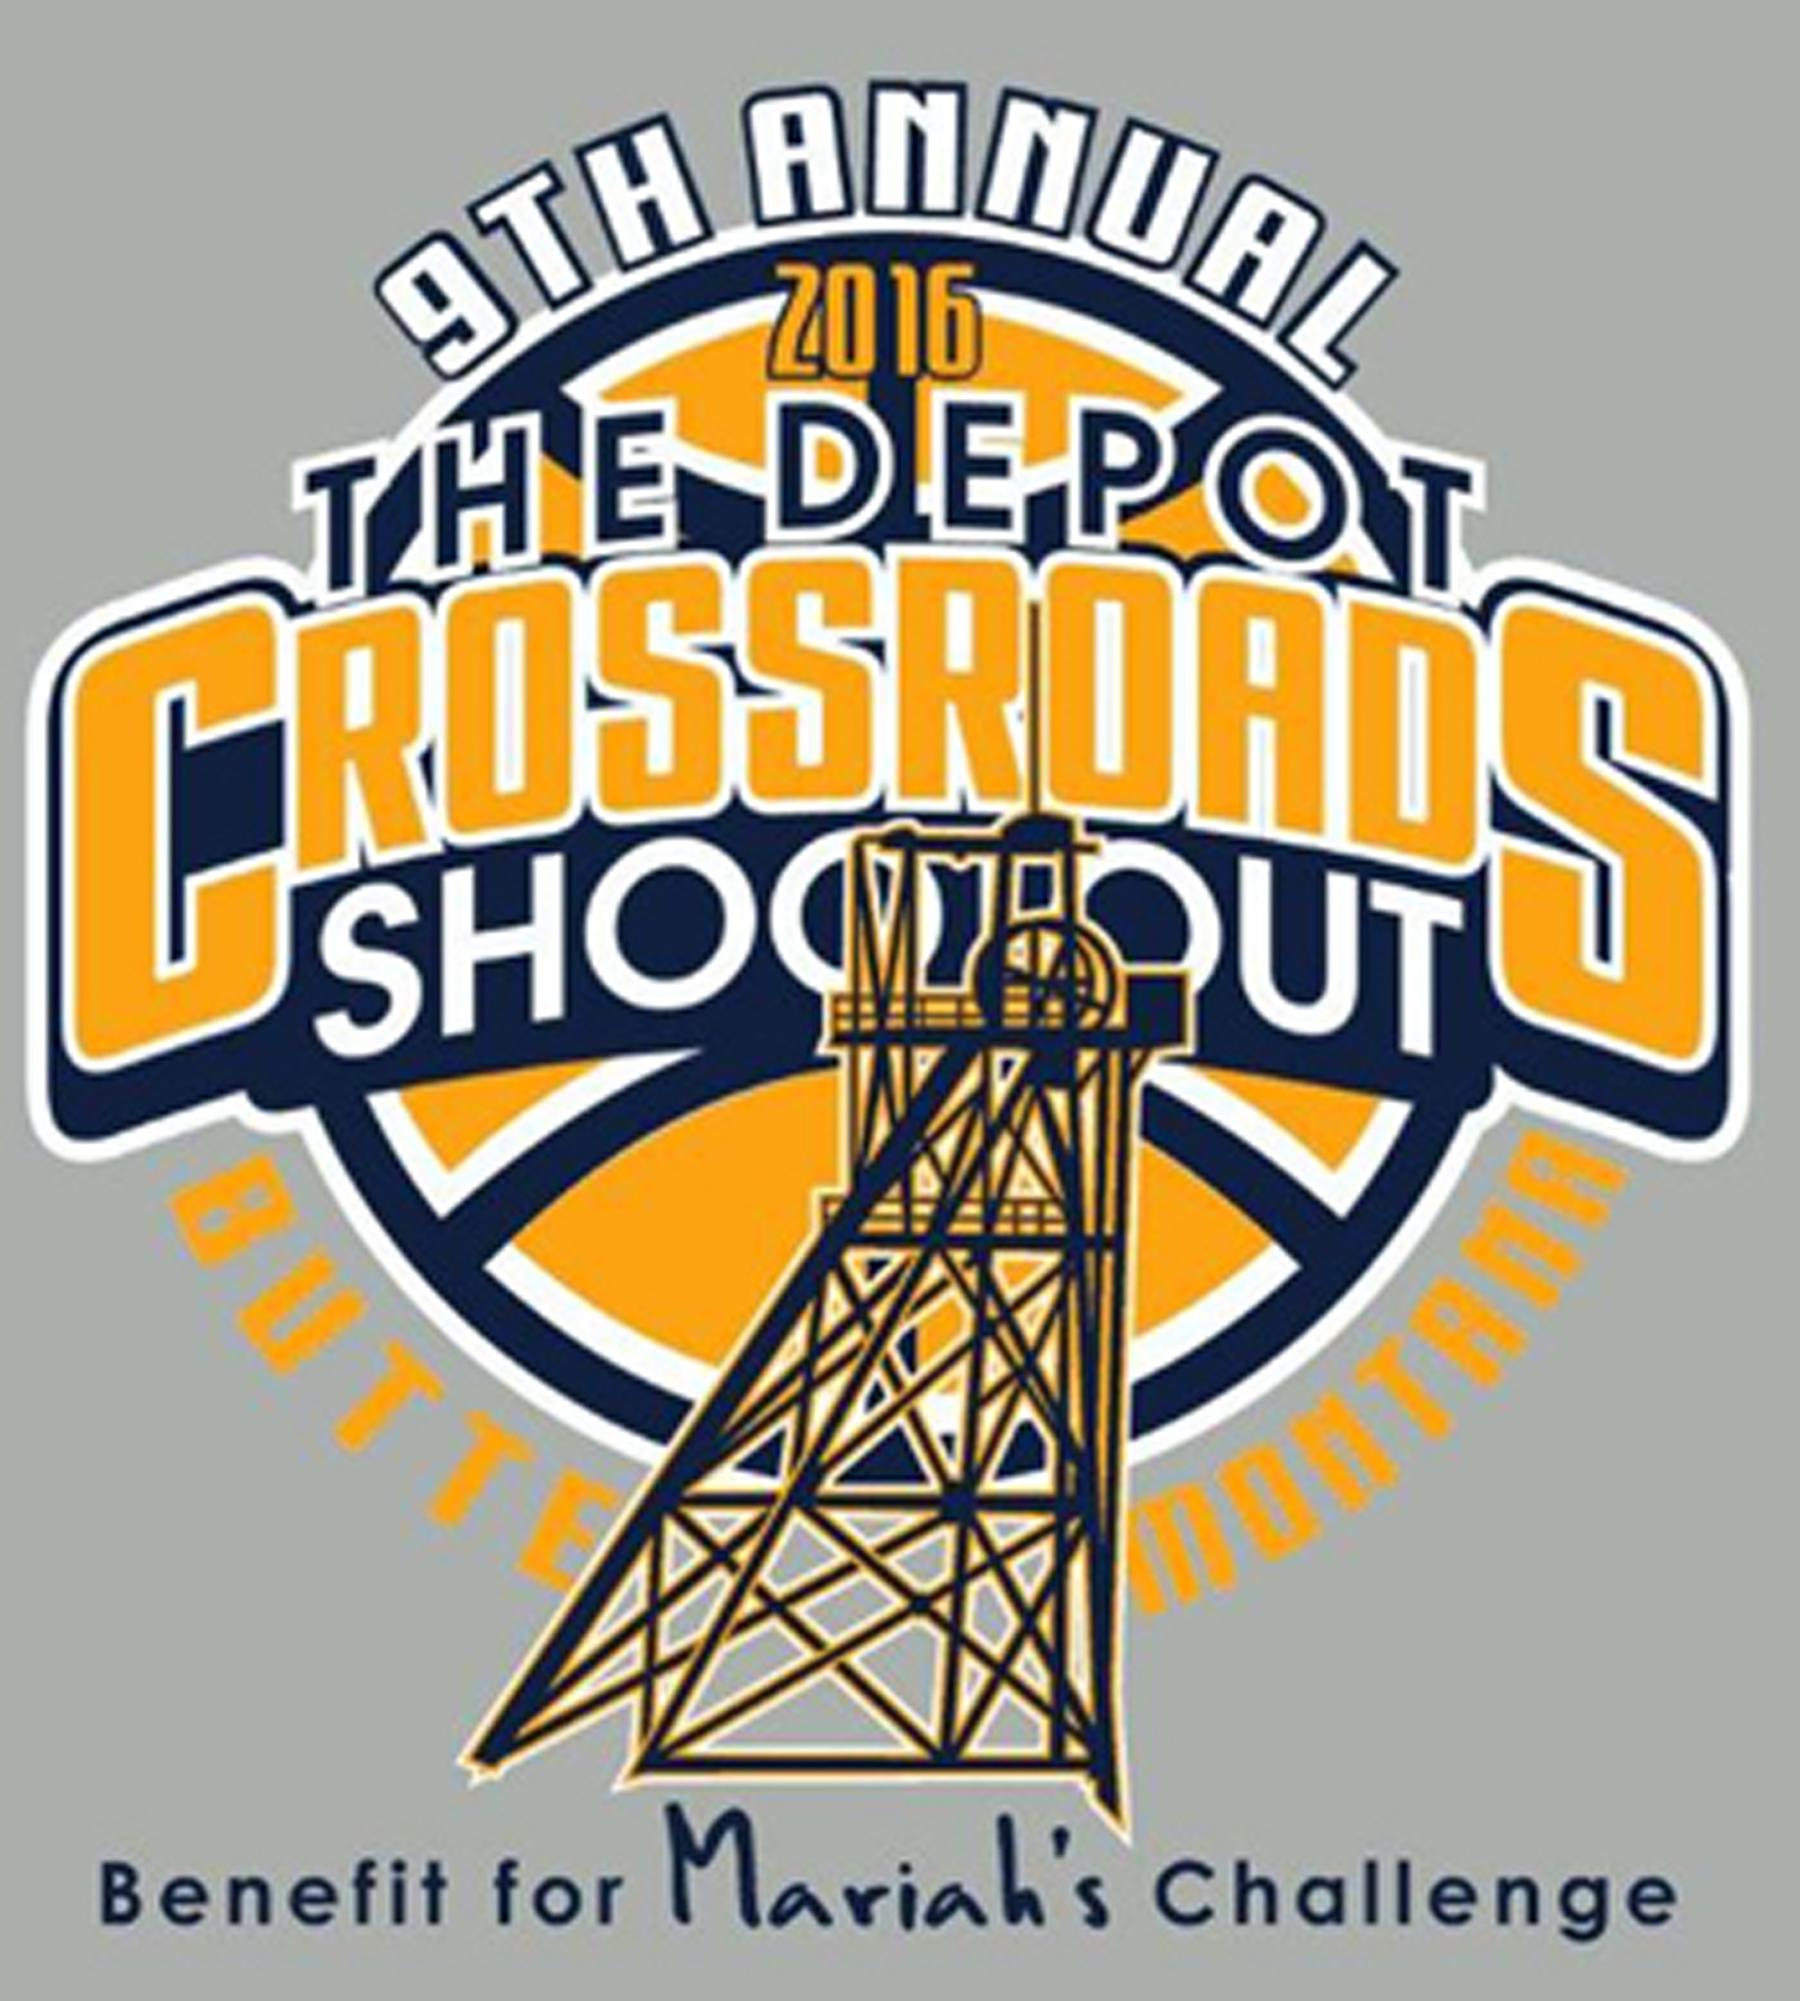 2016 Crossroads Shootout